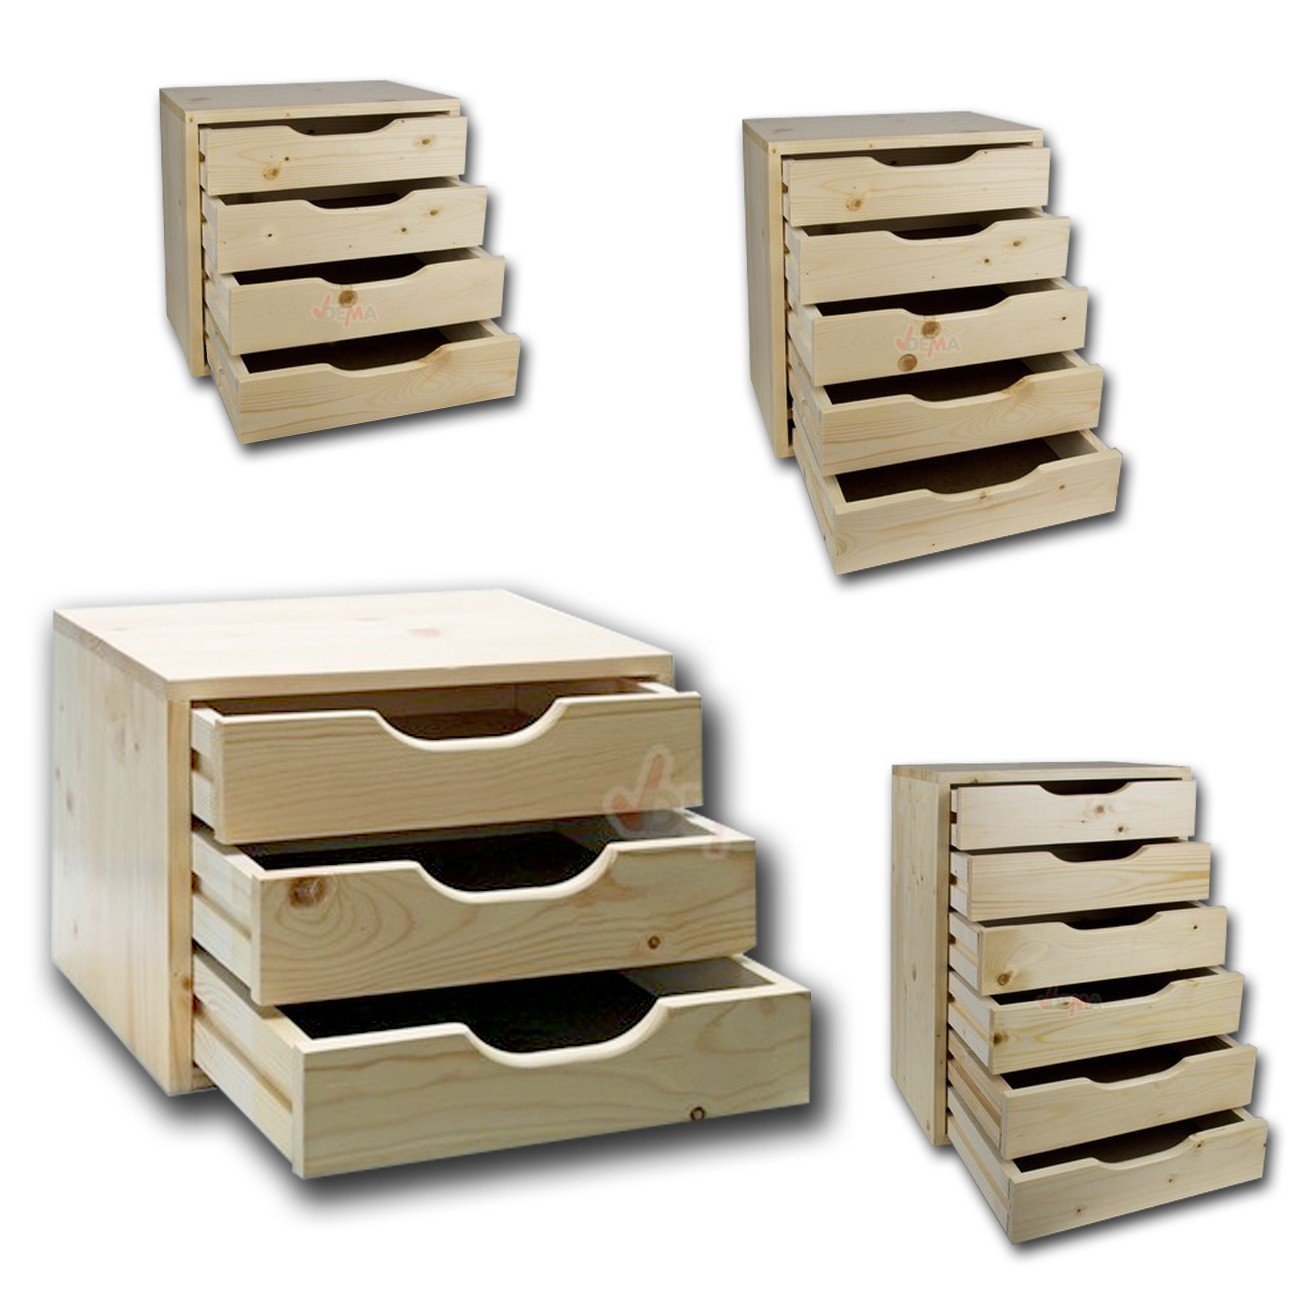 Holz Schubladenbox SB 3 / 4 / 5 / 6 Schubladen